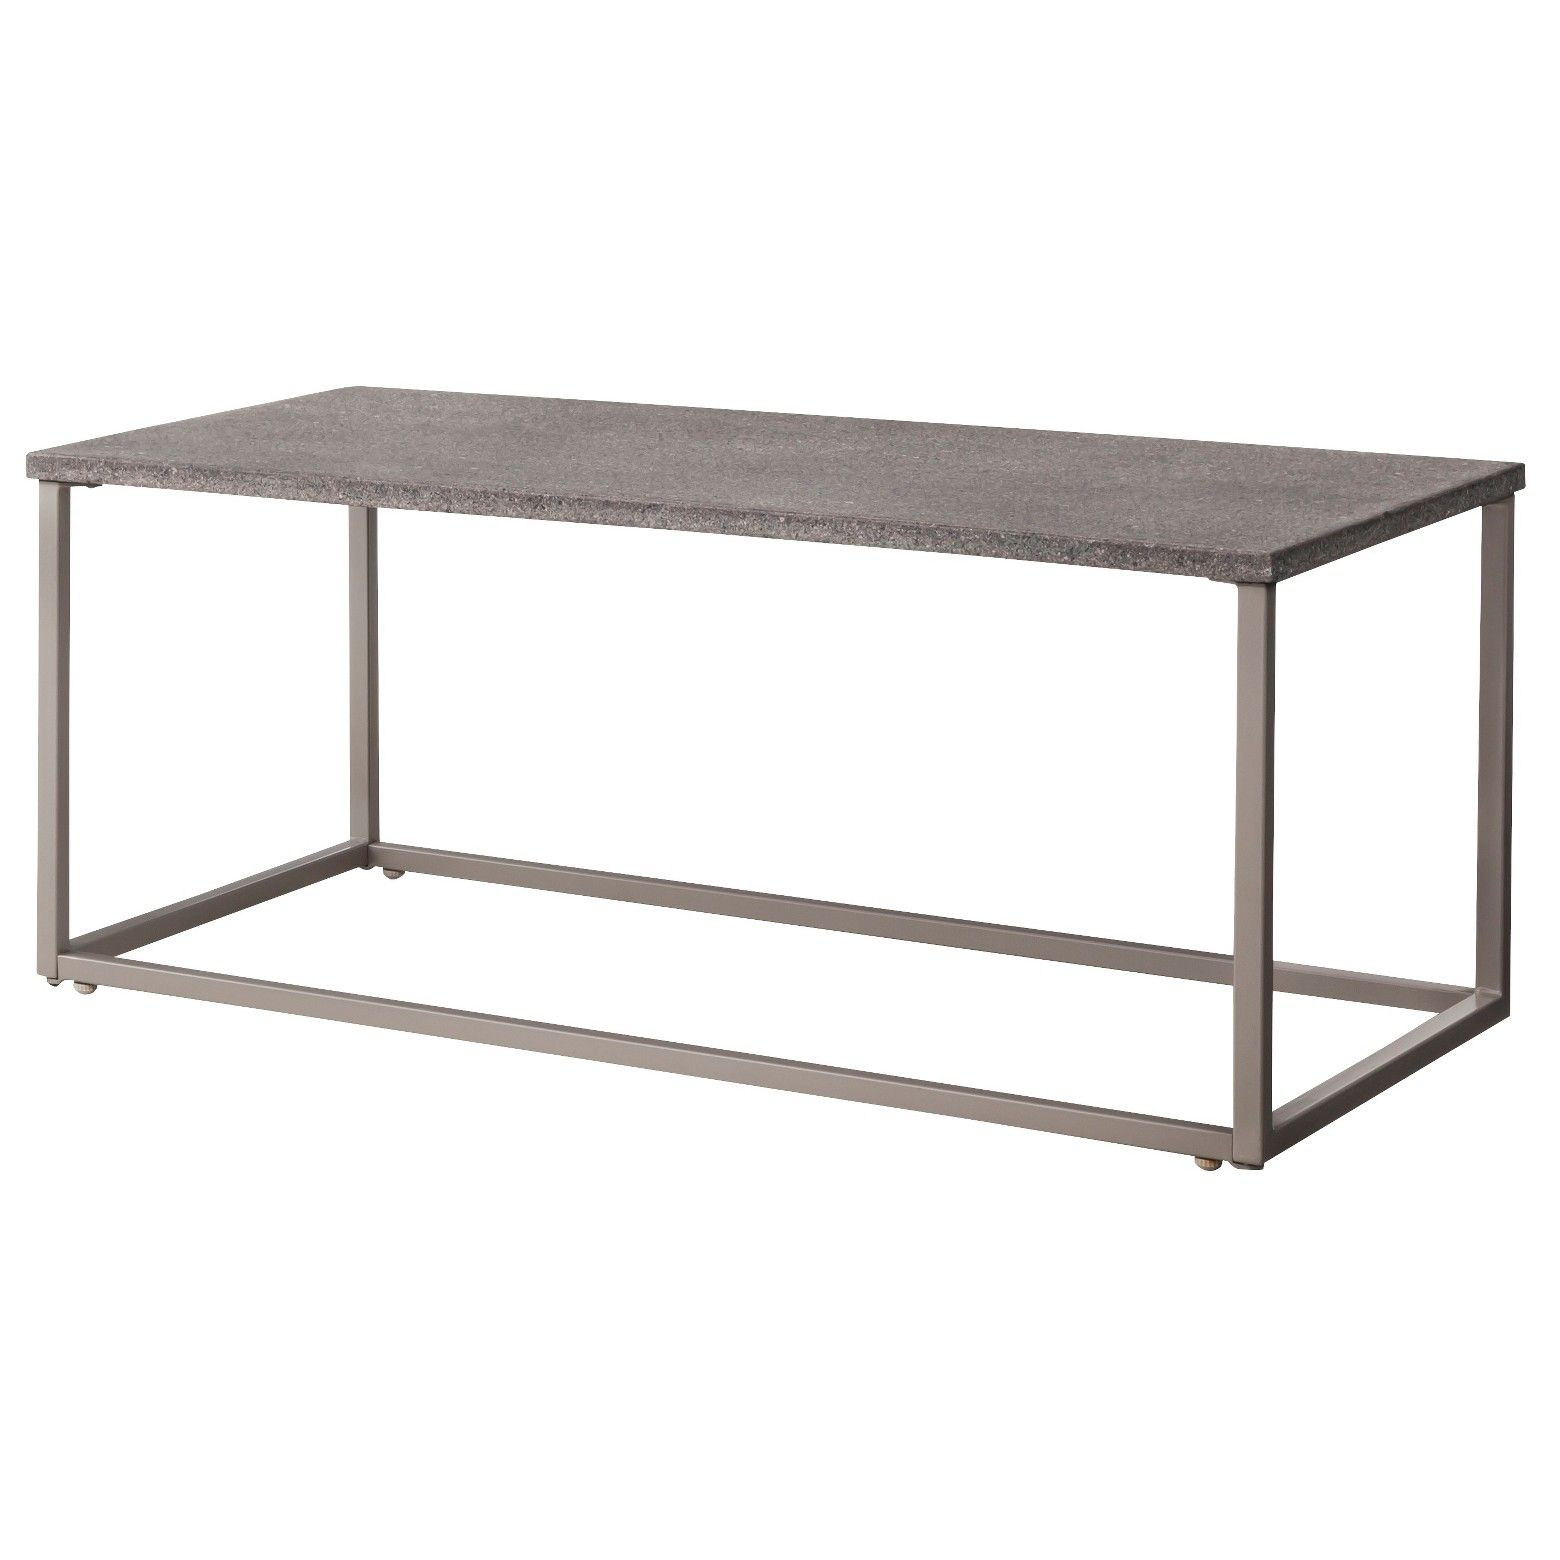 Heatherstone Metal Patio Coffee Table Threshold™